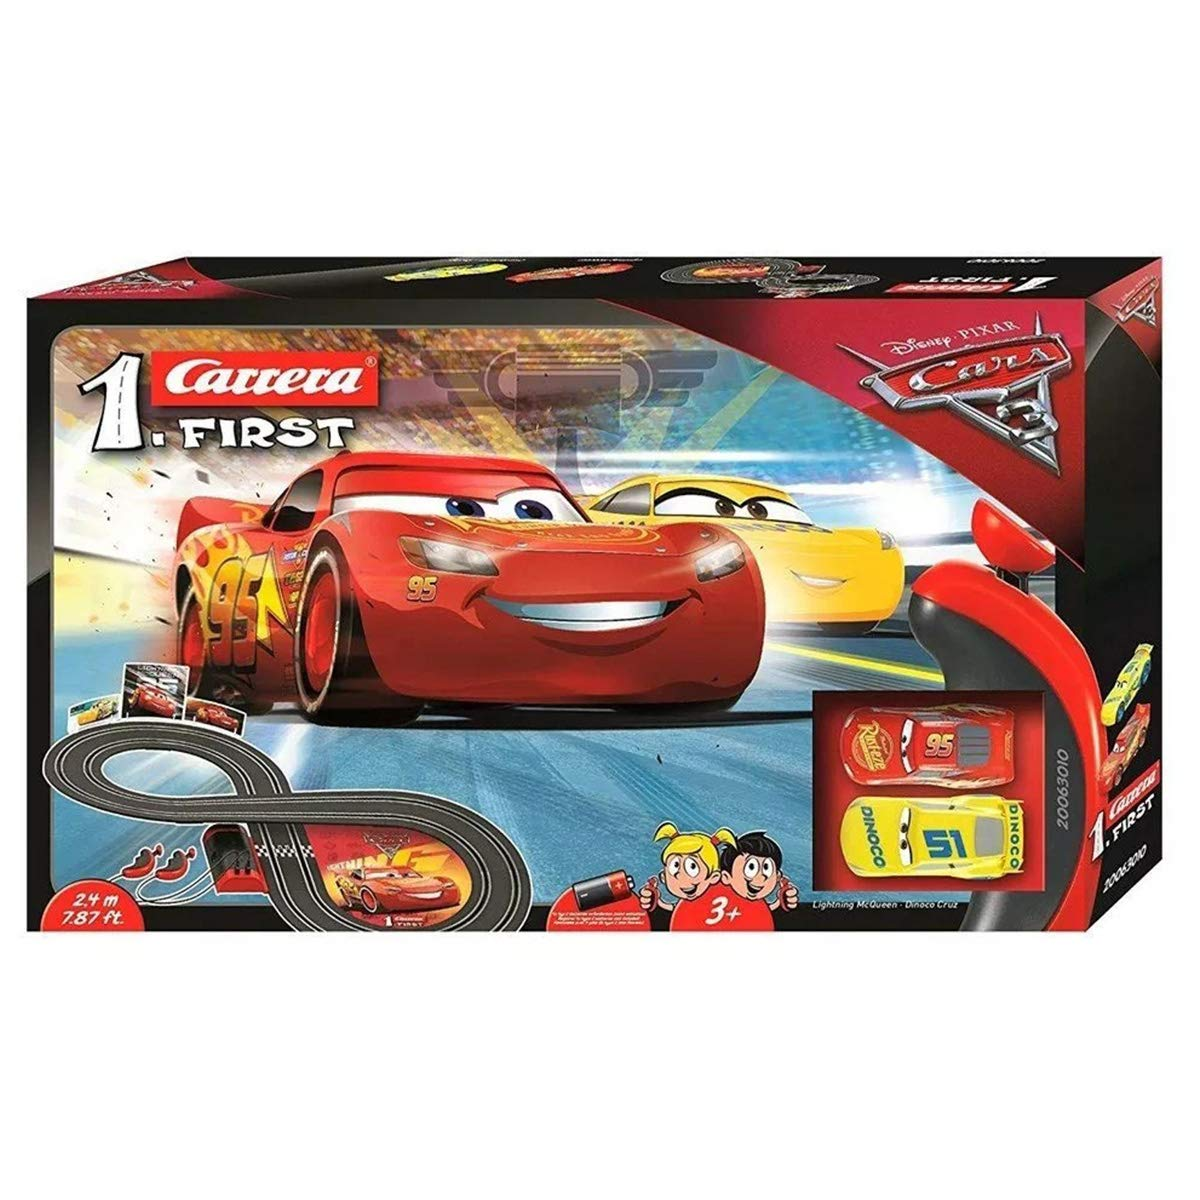 Carrera 20063010 First Rayo Mcqueen, Dinoco Cruz Disney·Pixar Circuit Cars, Black, 2.4 m